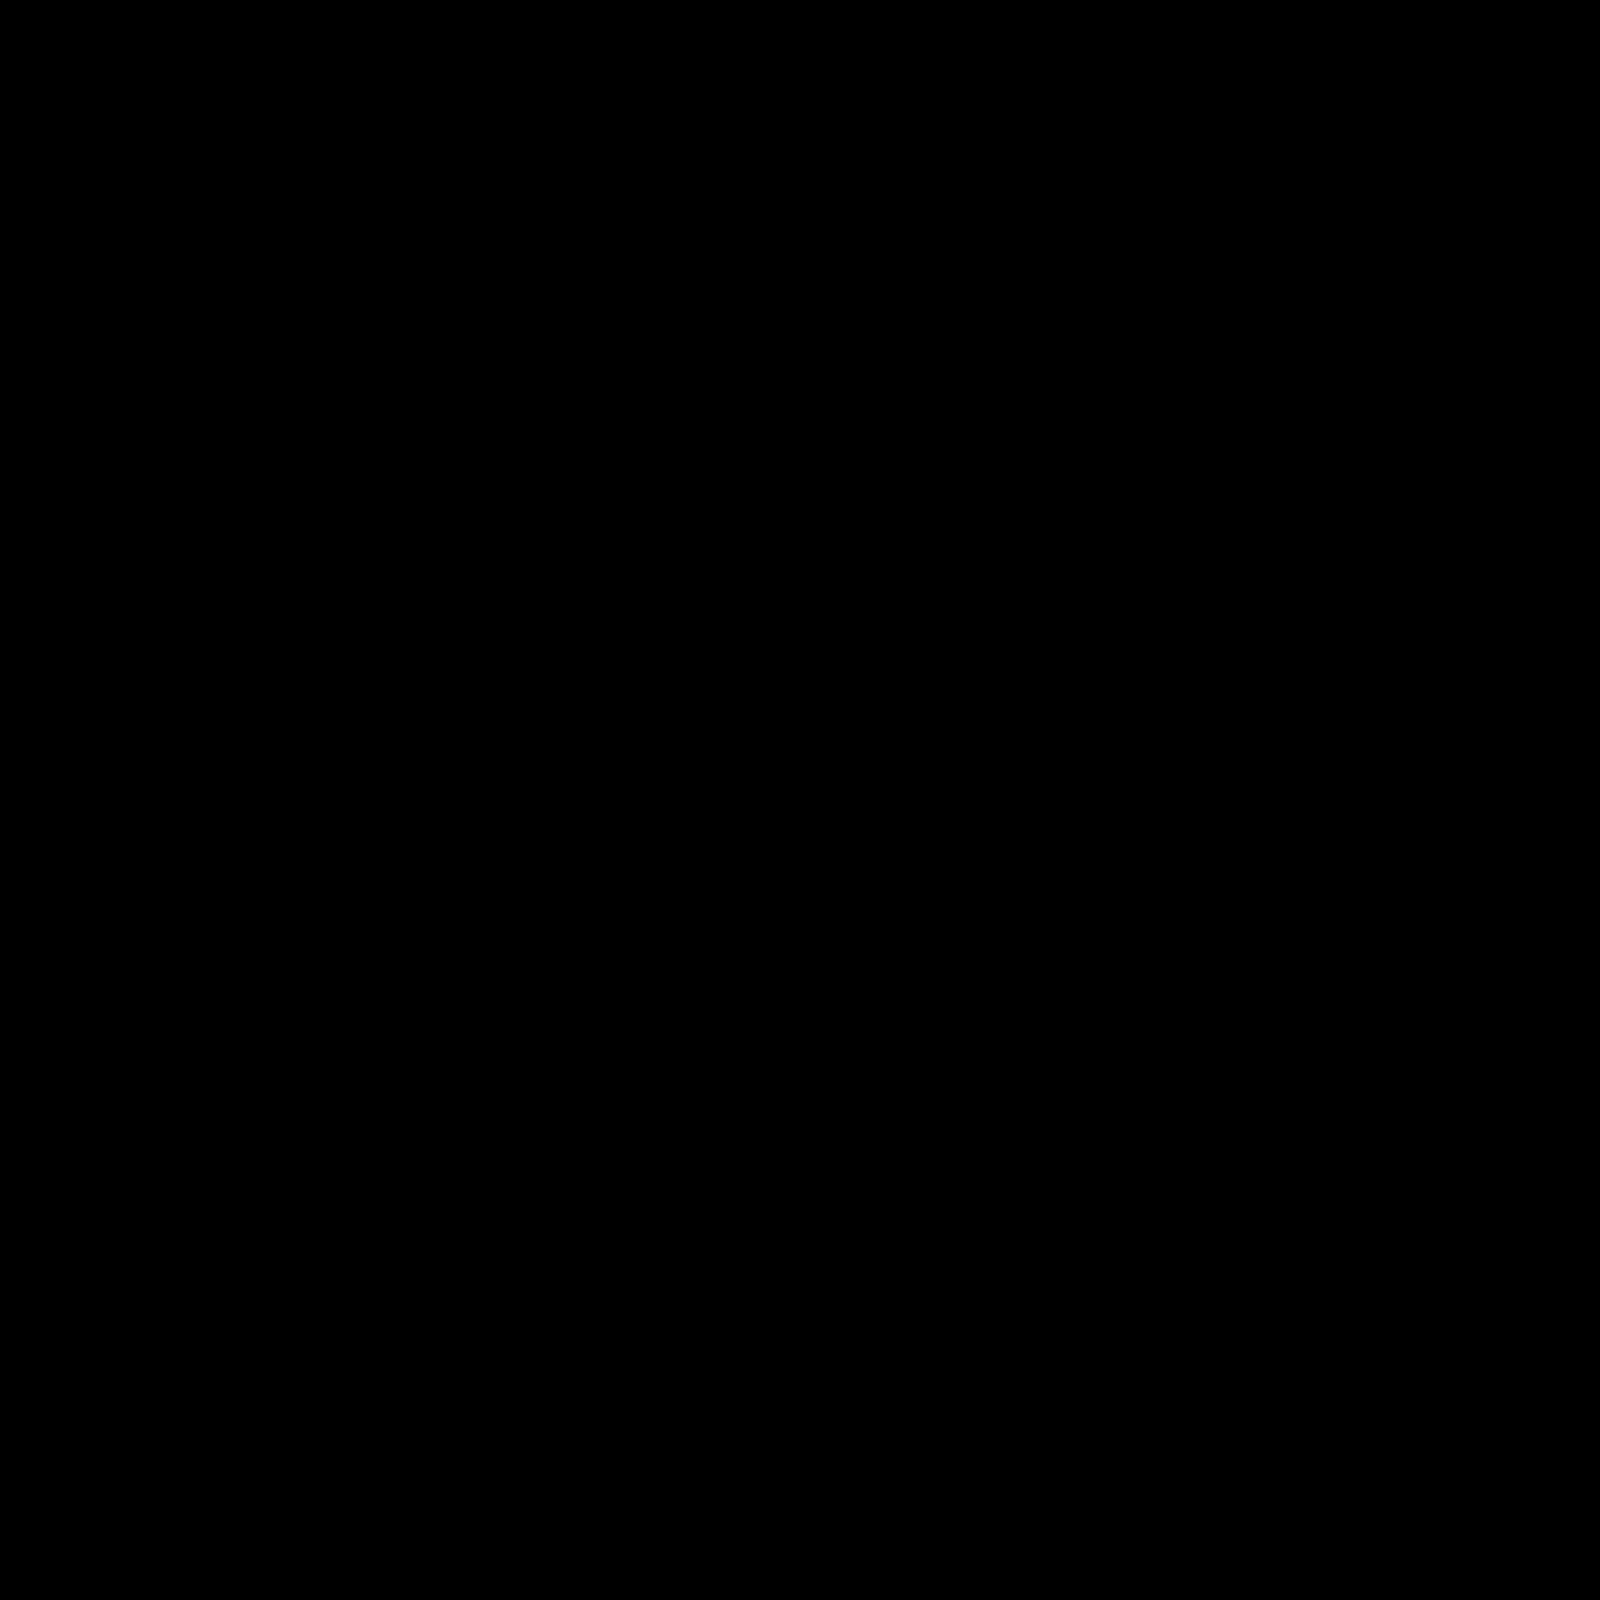 Dżudo icon